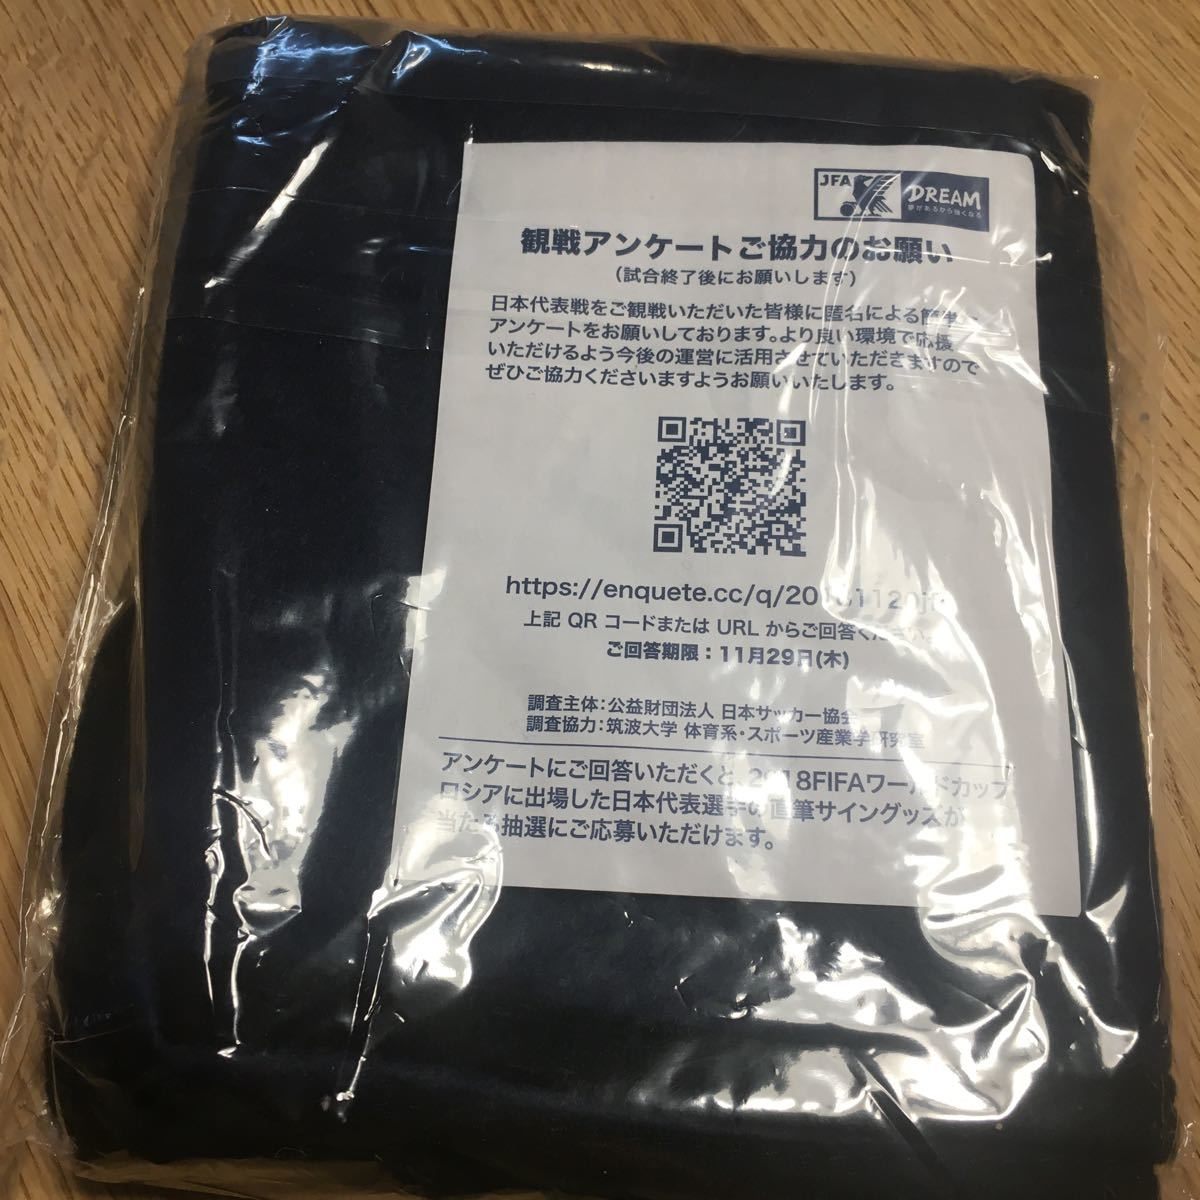 JFA キリンチャレンジカップ 2018.11.20 愛知 フリース 膝掛け ブランケット ネイビー 2個組